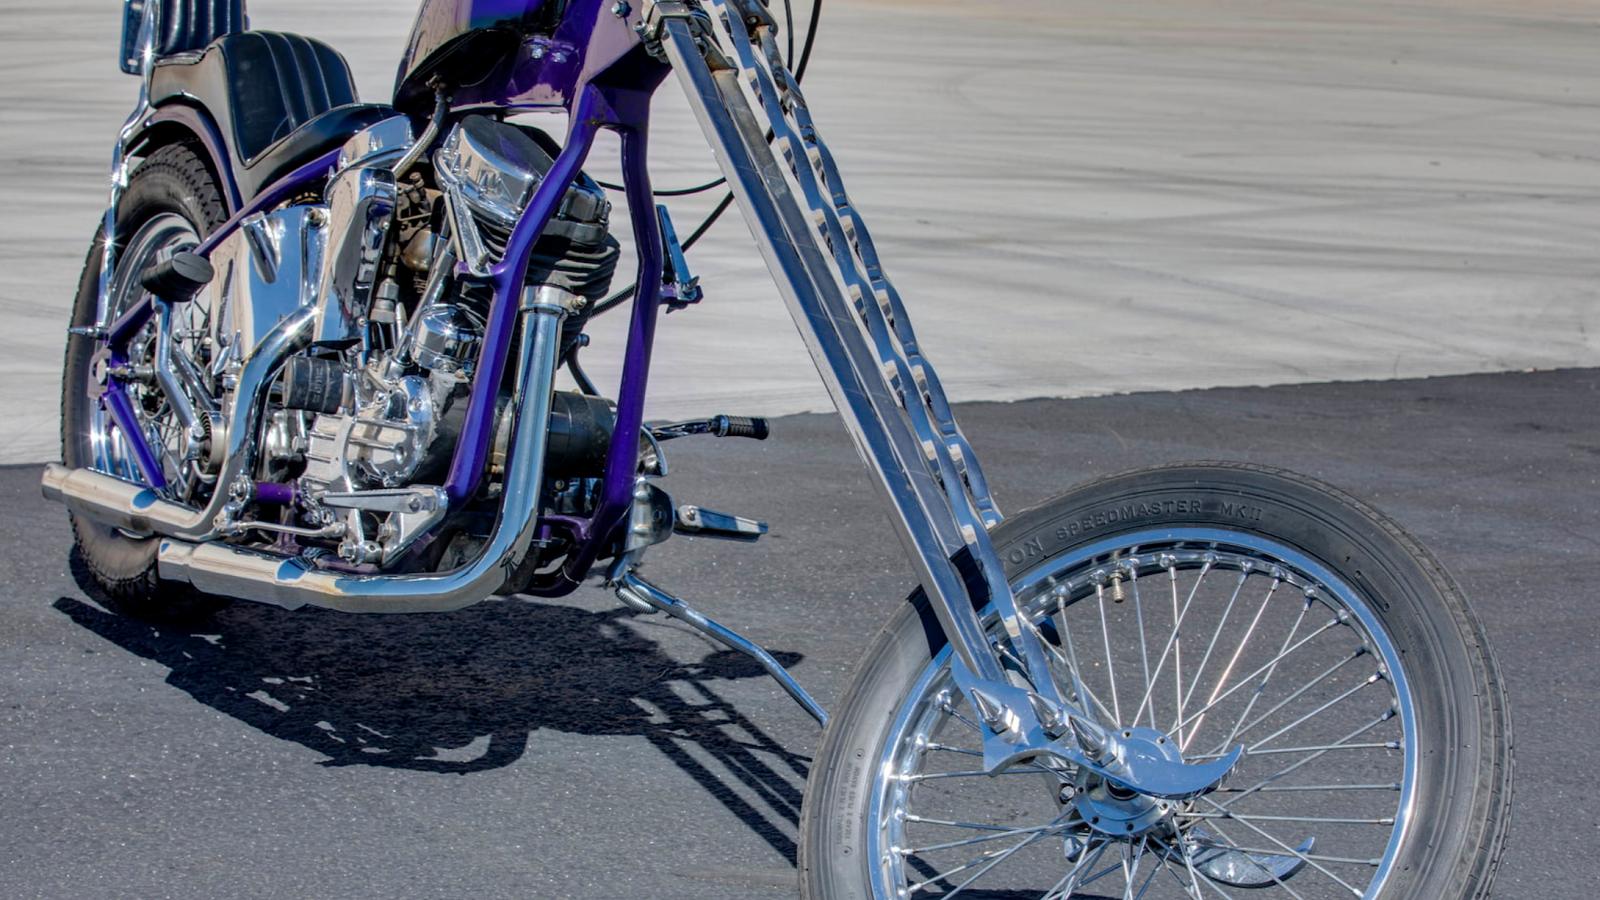 1954 Harley-Davidson Panhead Chopper Is a '70s Original